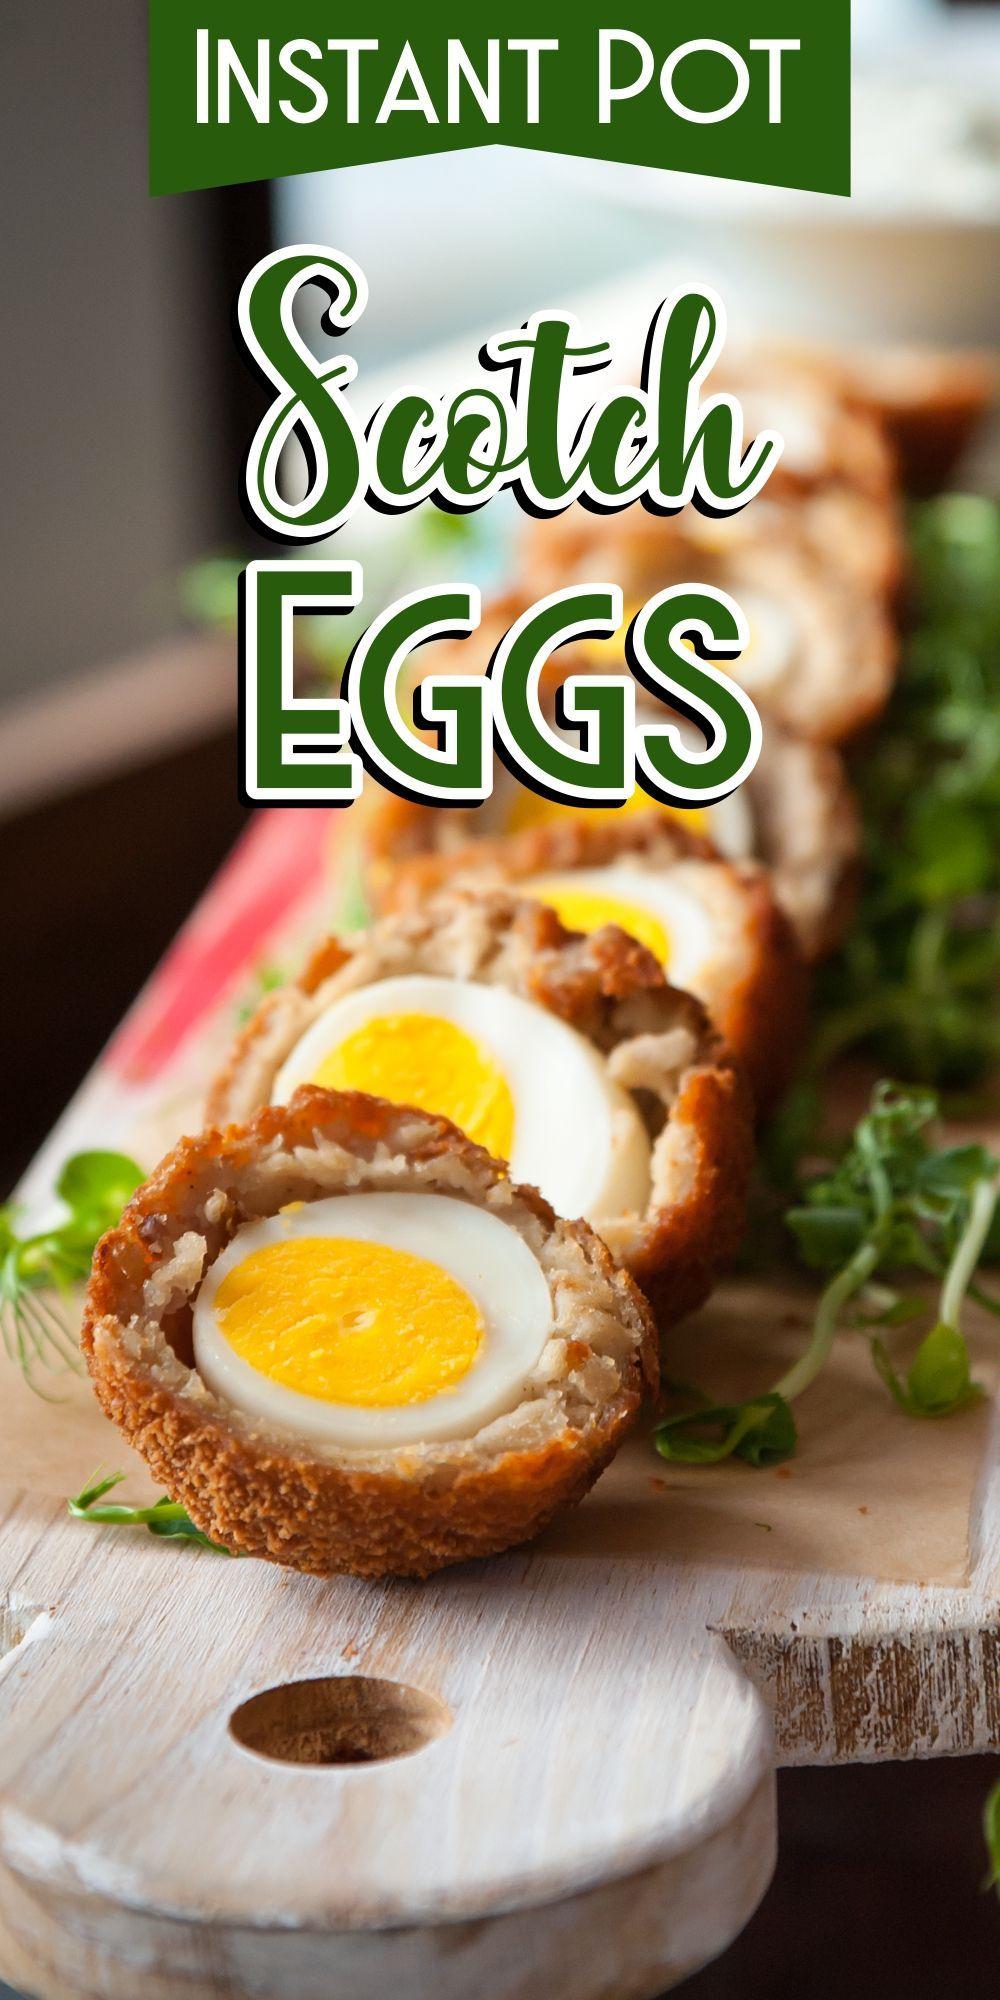 Pressure Cooker Scotch Eggs #instantpotrecipeseasy